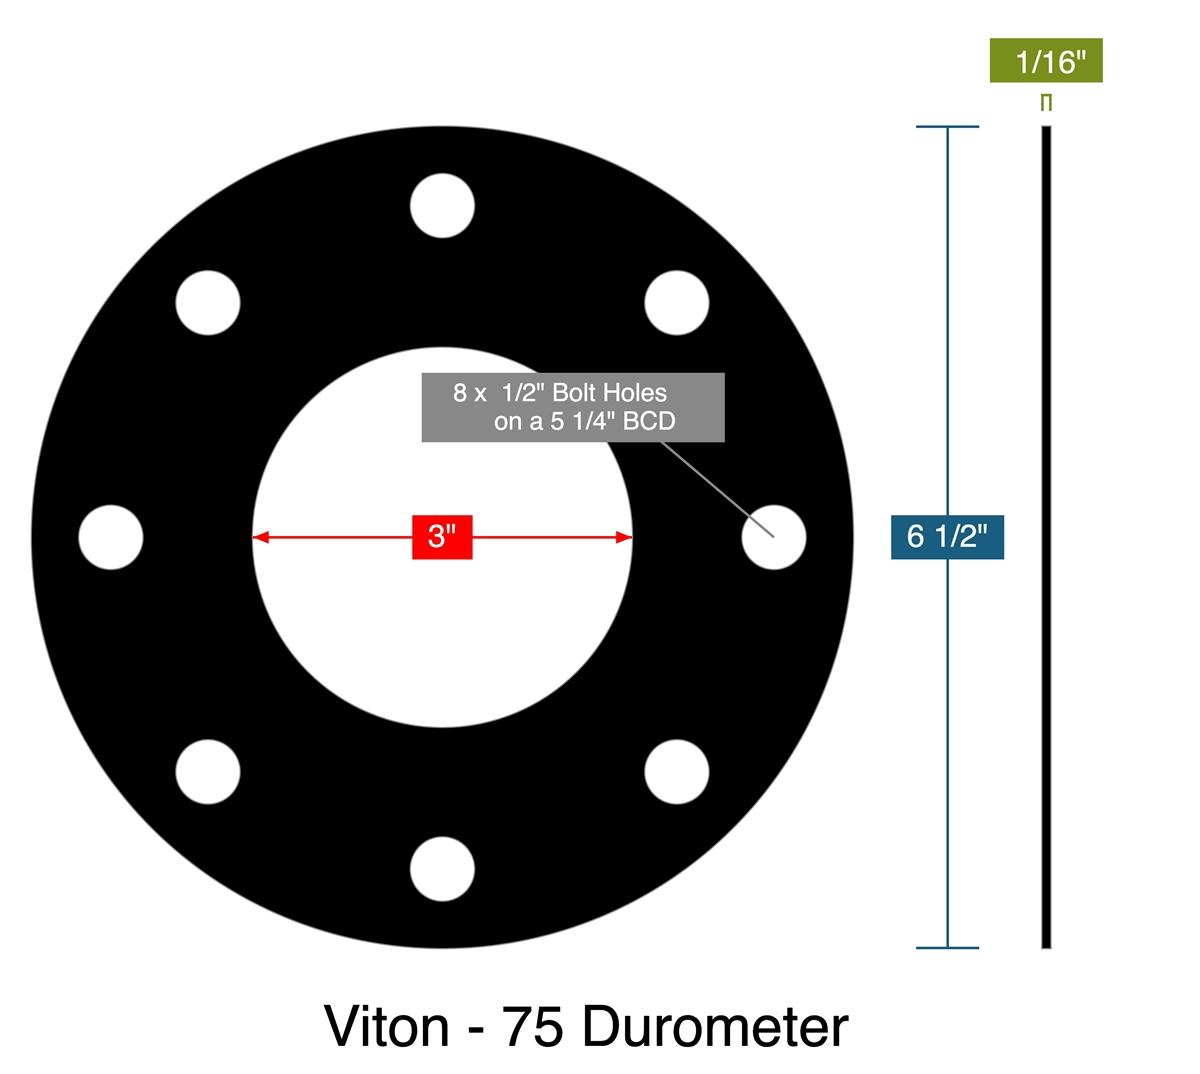 FKM 0.183 Thick 6.778 ID 364 Viton Black Backup Ring 90A Durometer